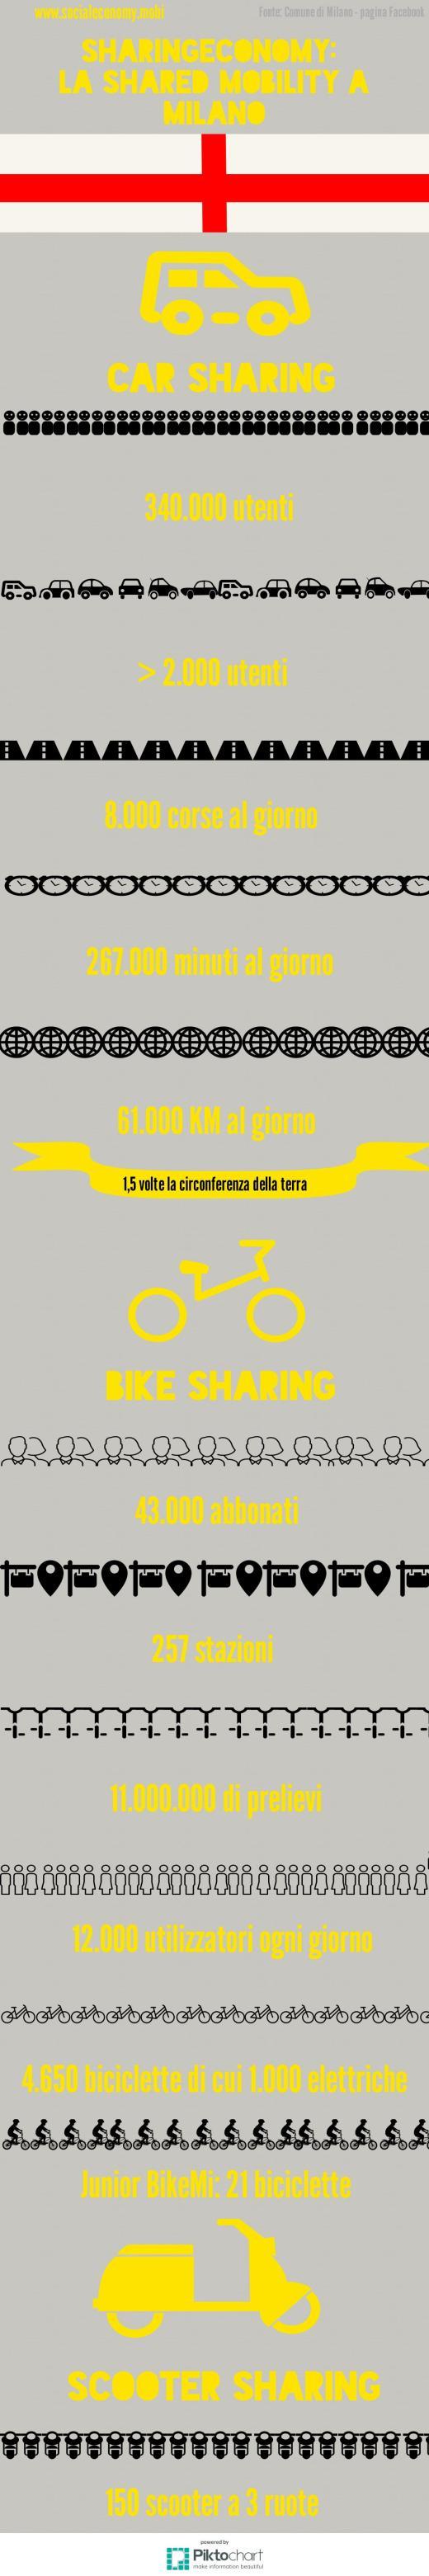 sharing economy milano sharingeconomy mobilità condivisa car sharing Copy 2015(3)